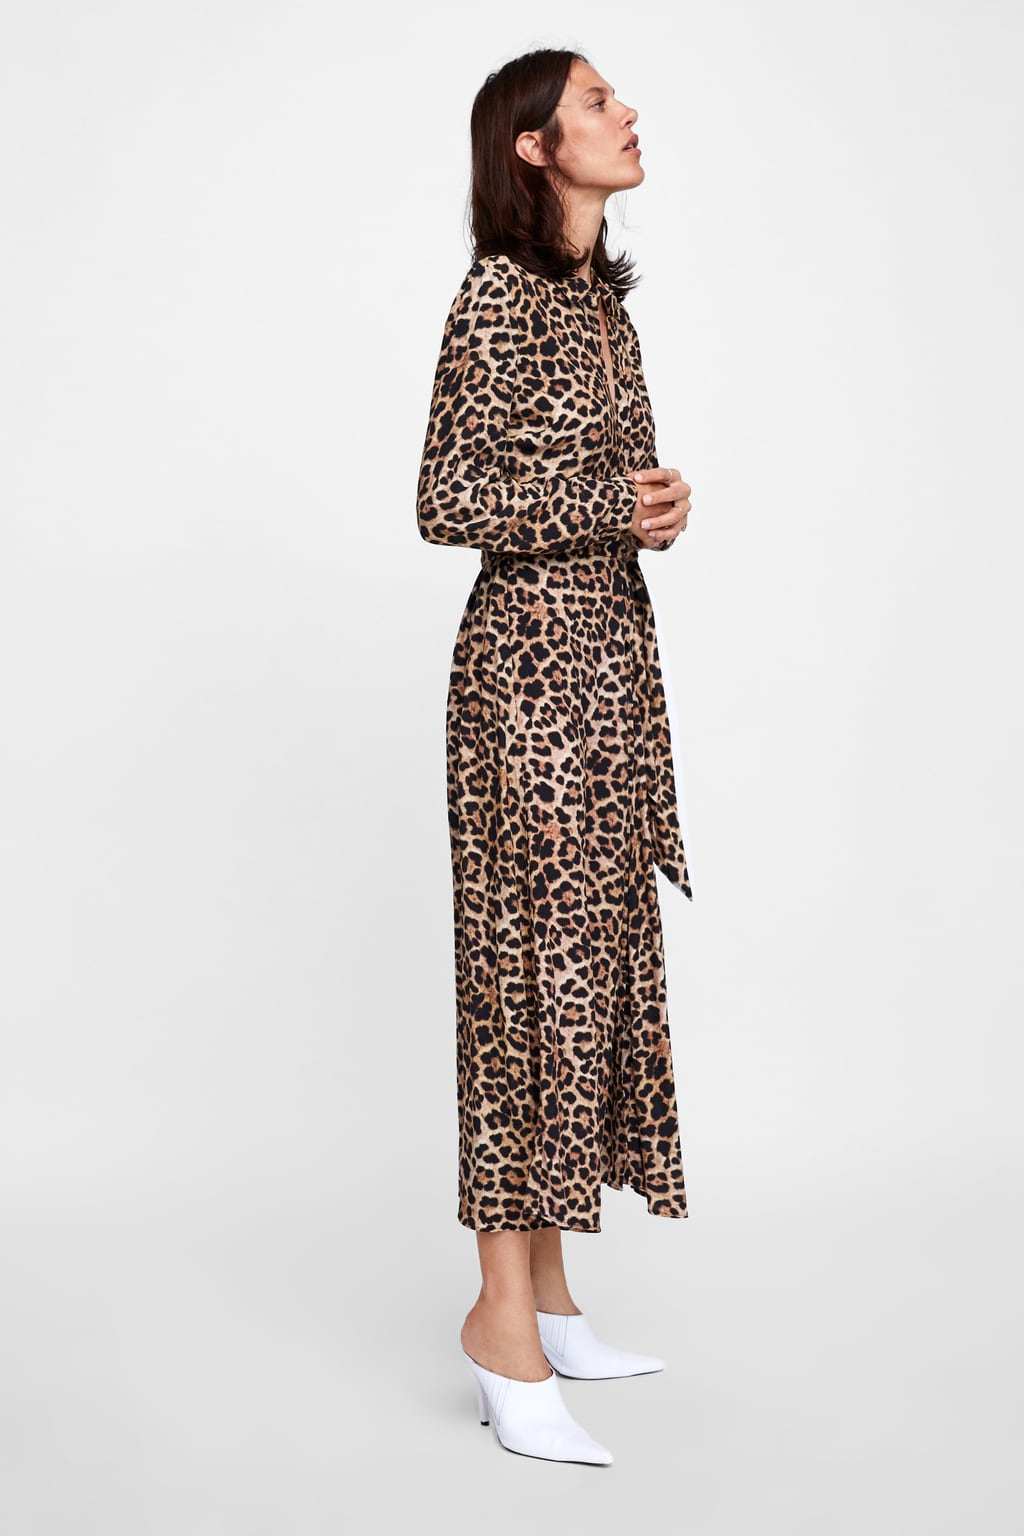 Zara, Dress, £39.99